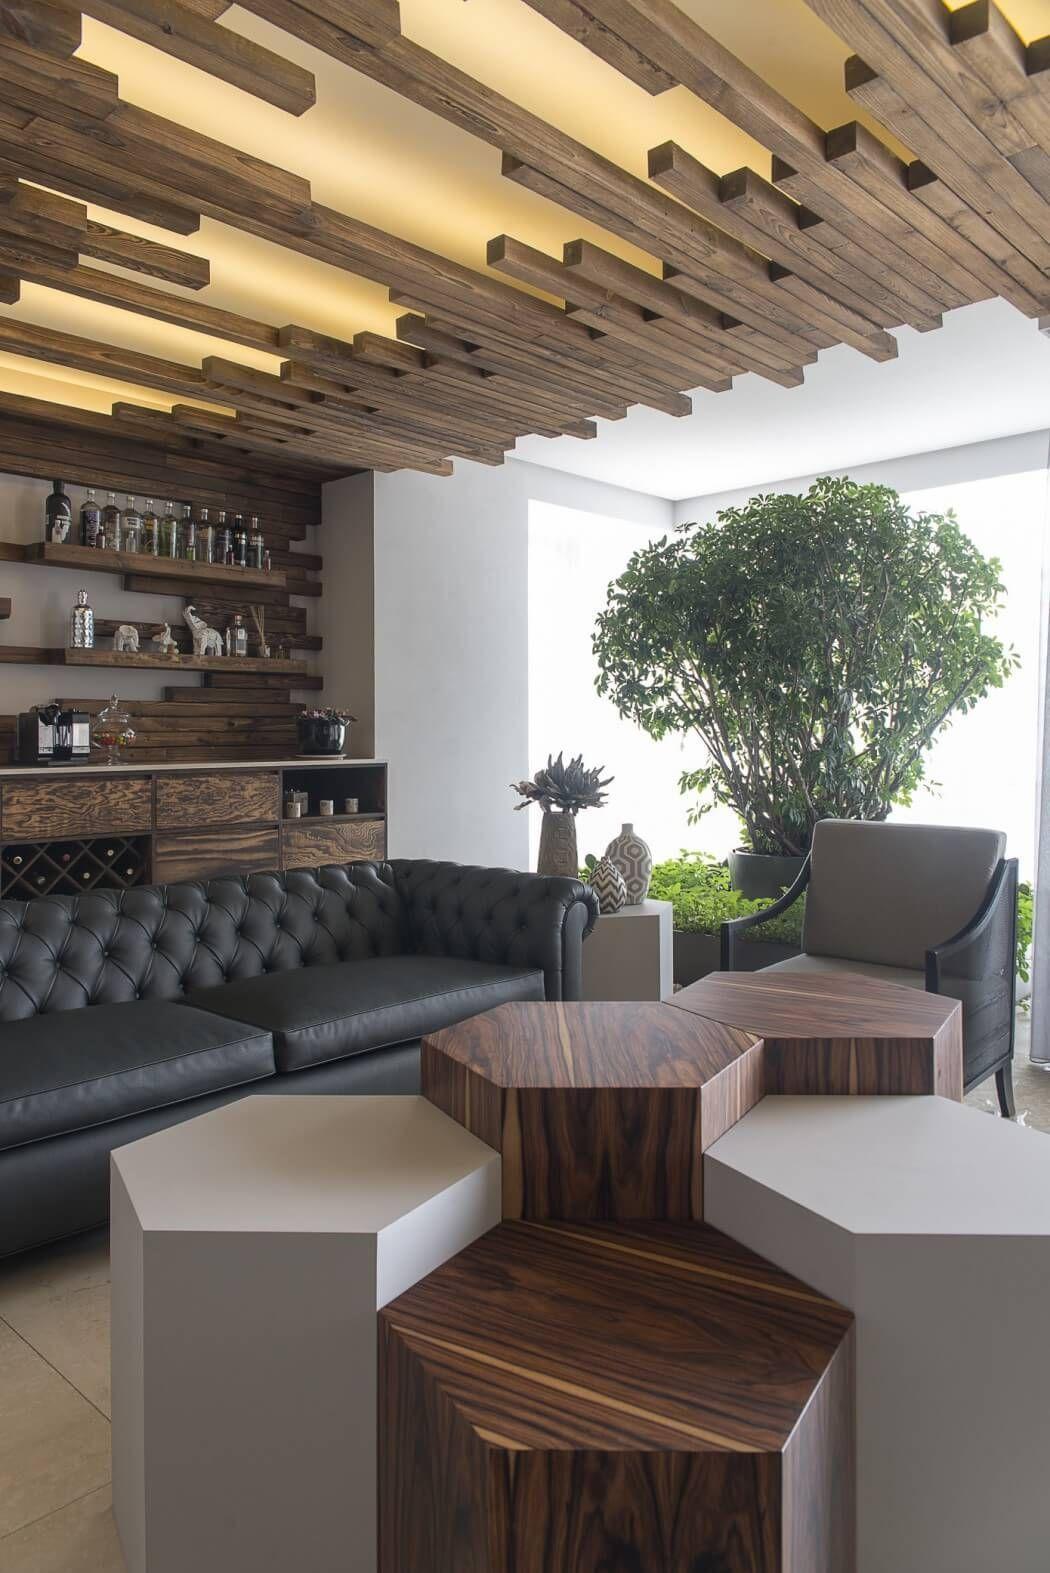 7 Best Cheap Basement Ceiling Ideas In 2018 Basement Cei